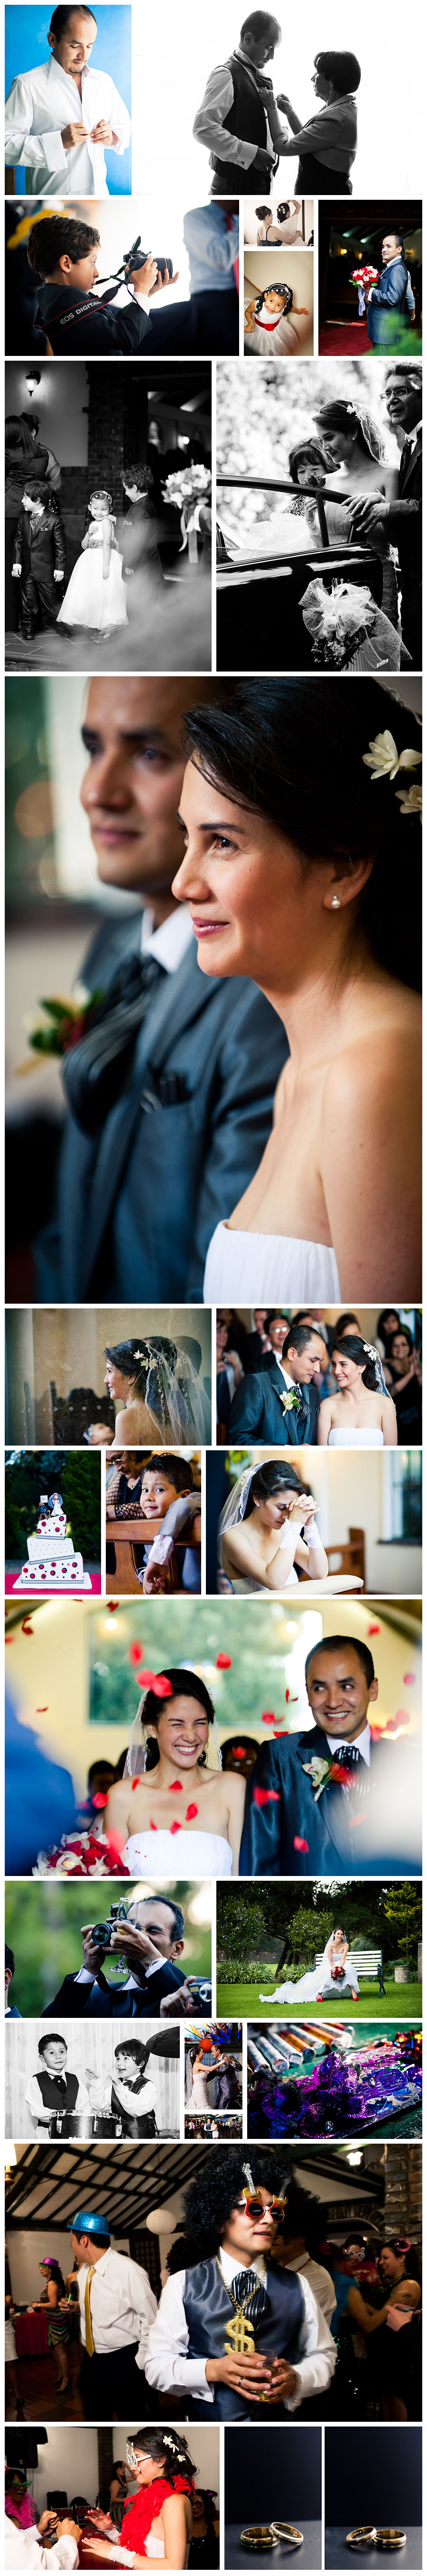 boda hacienda monteleon copy